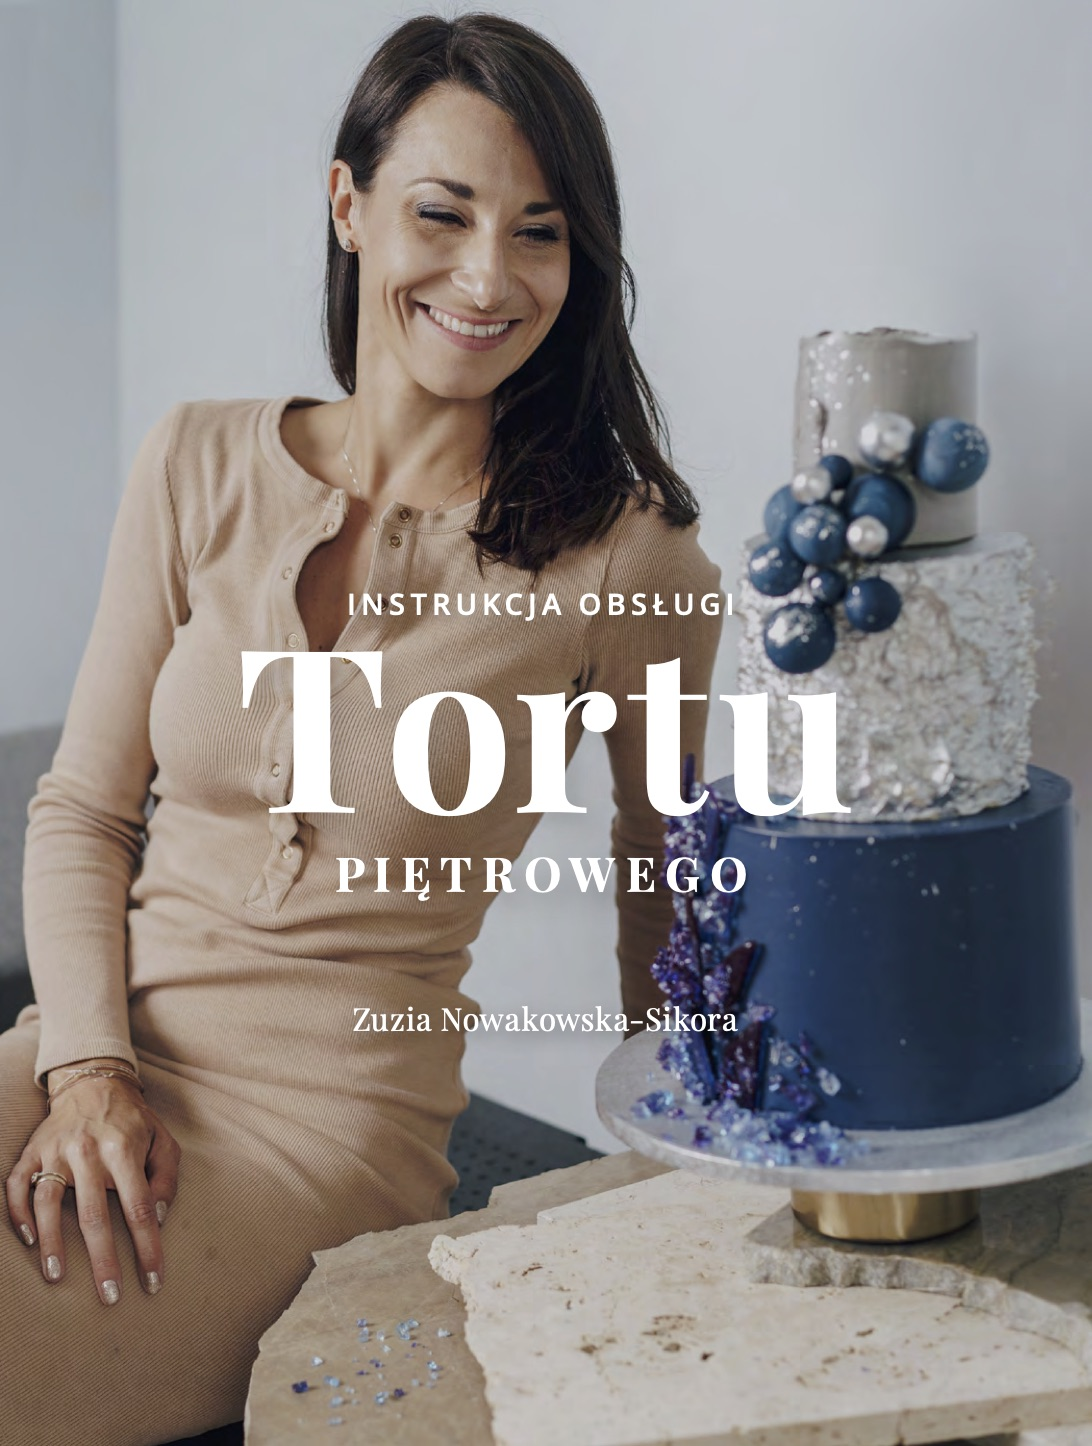 instrukcja obslugi tortu Zuzanna Nowakowska Sikora eBook KUP TERAZ